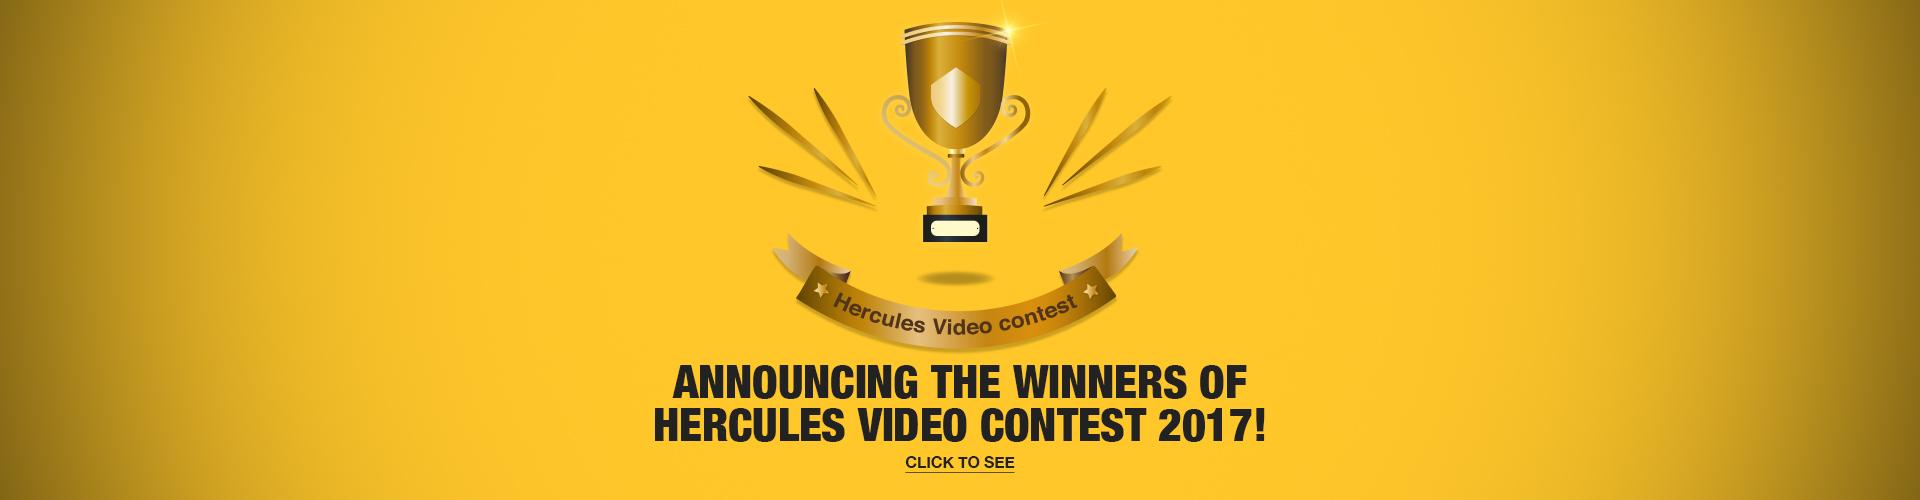 Hercules Video Contest 2017